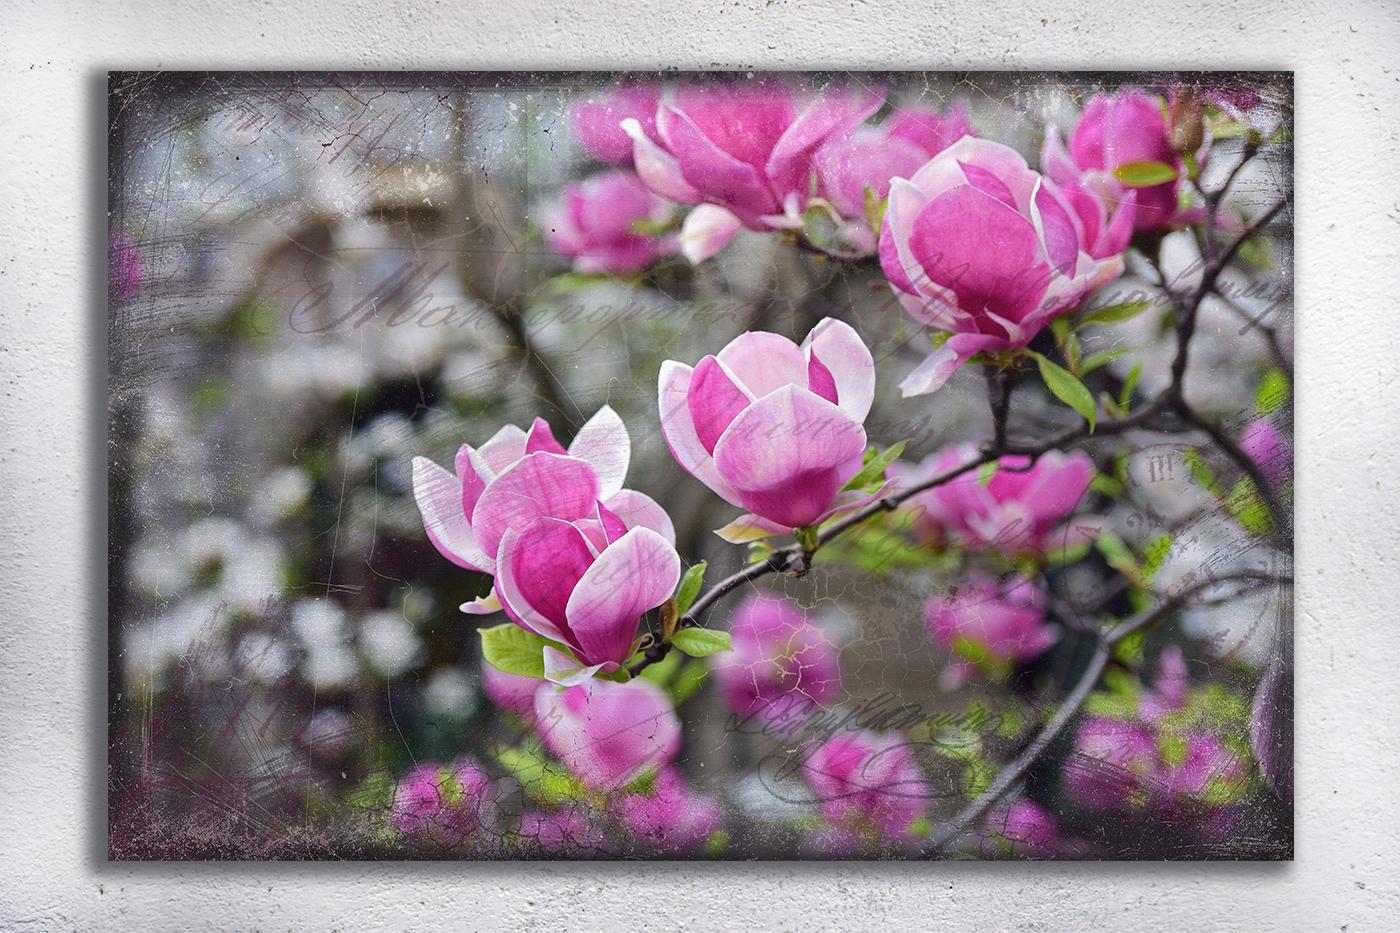 Nature photo, floral photo, spring photo, magnolia photo example image 2